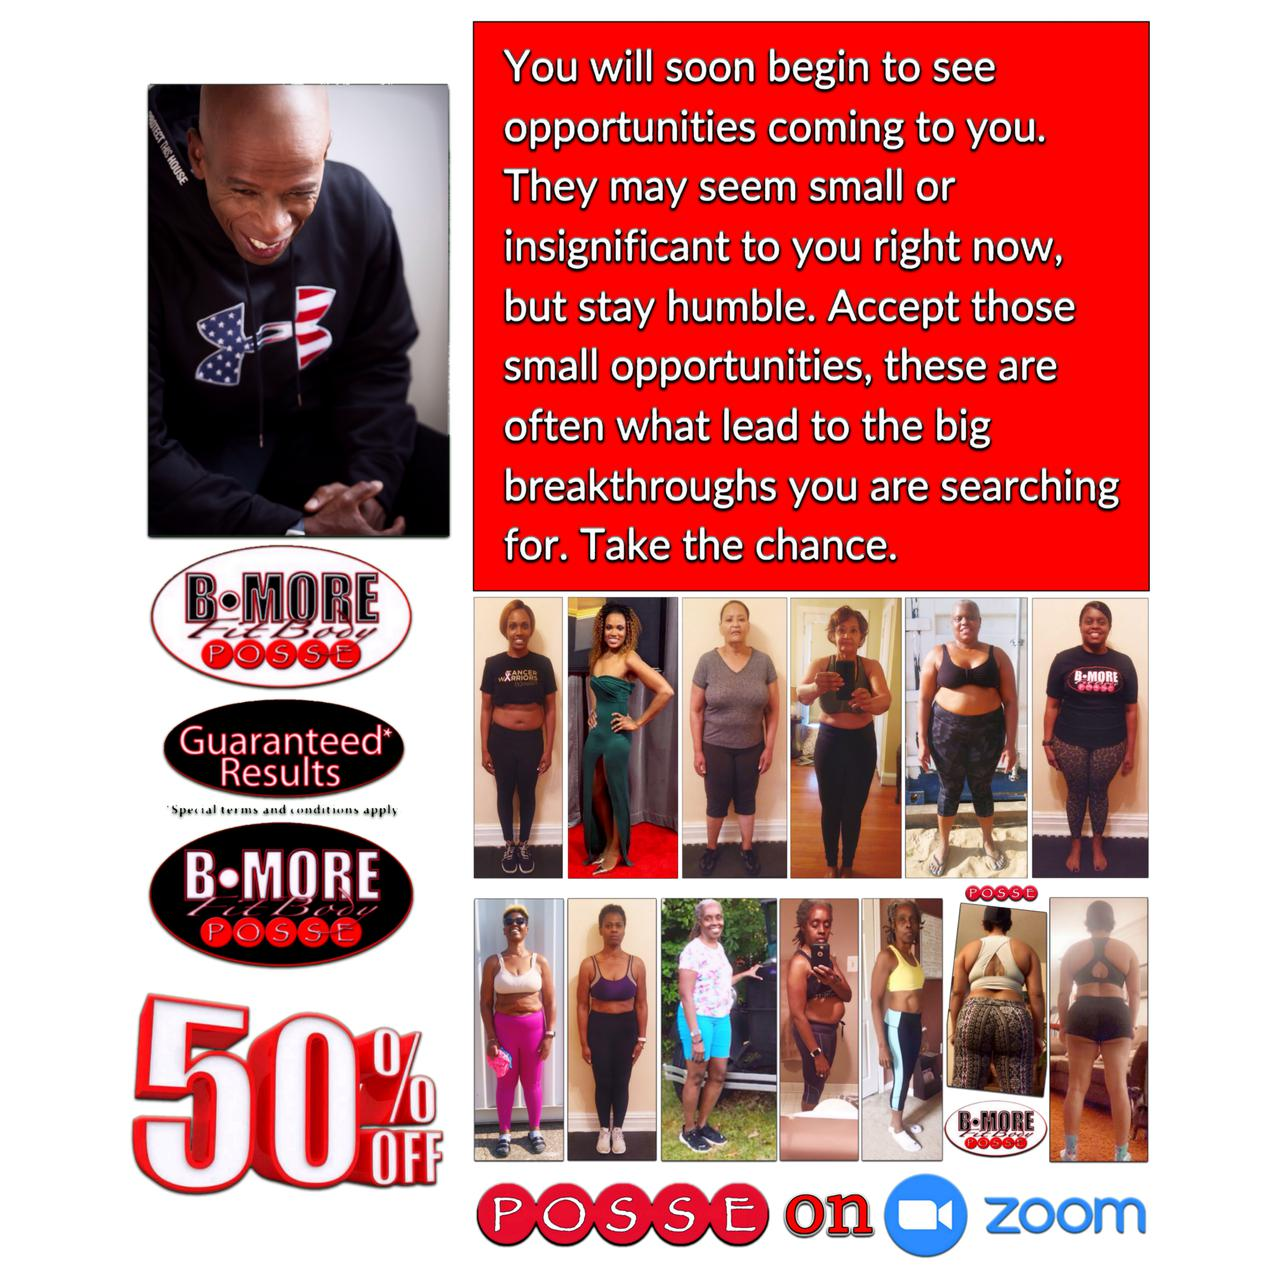 borefitbody POSSE health lifestyle coach.